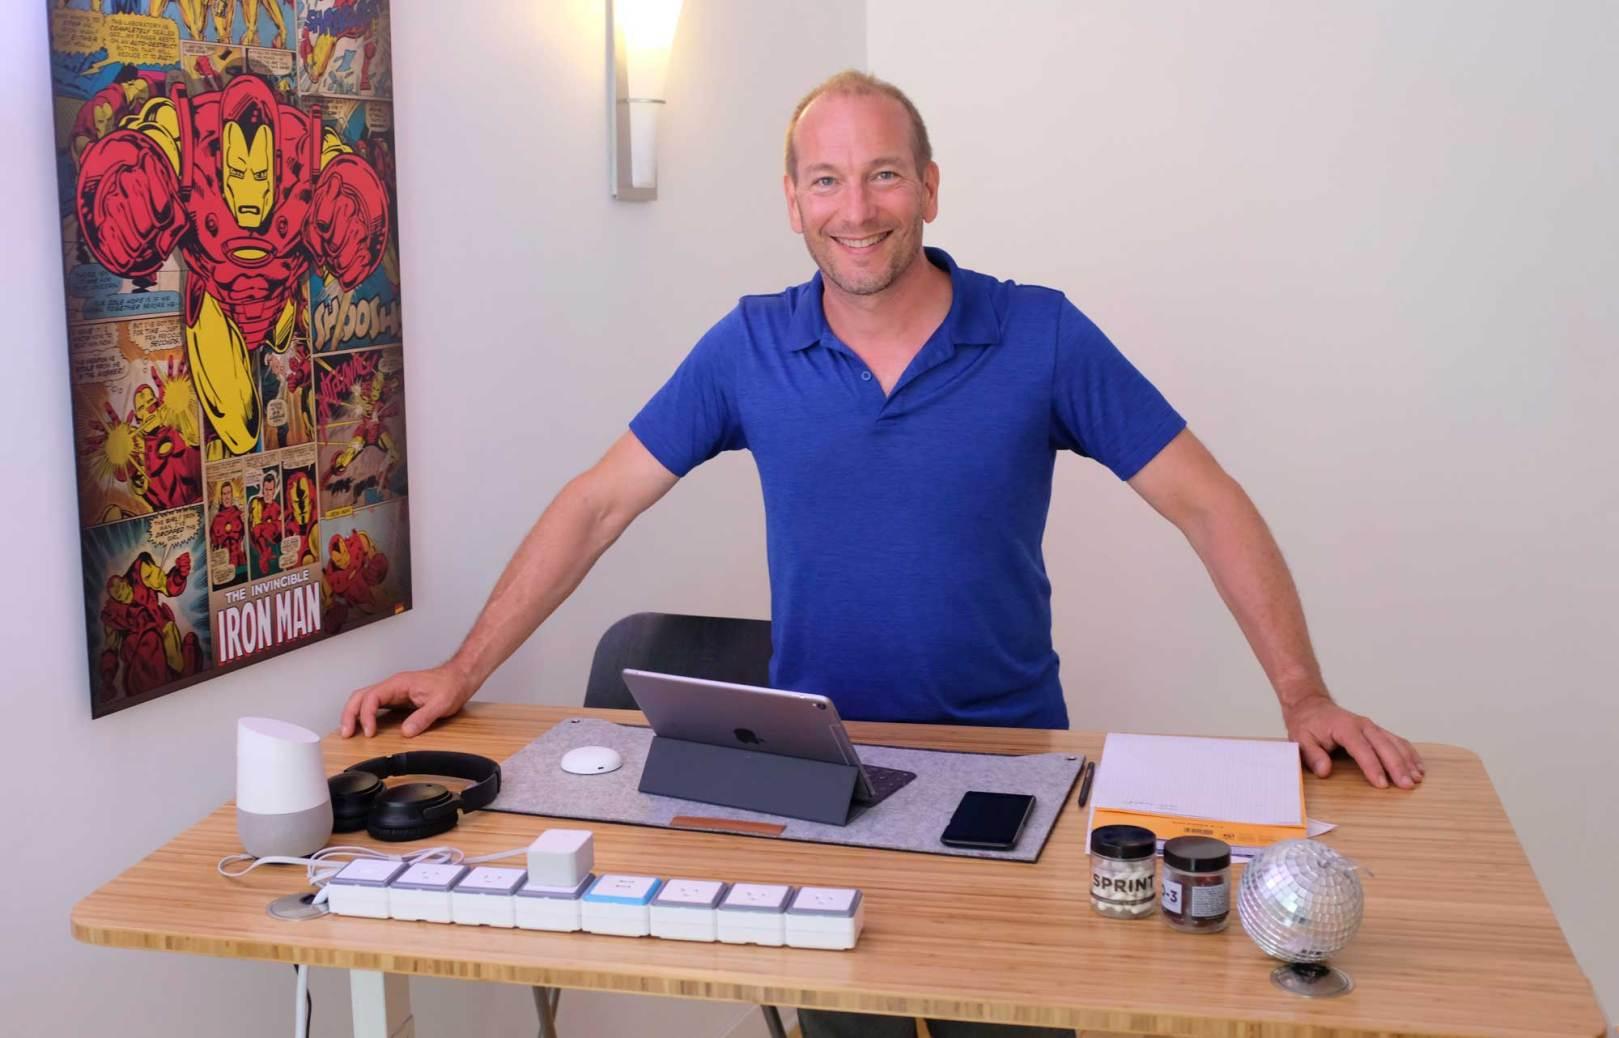 bureau ajustable Smartdesk Home Office Premium Pascal Forget